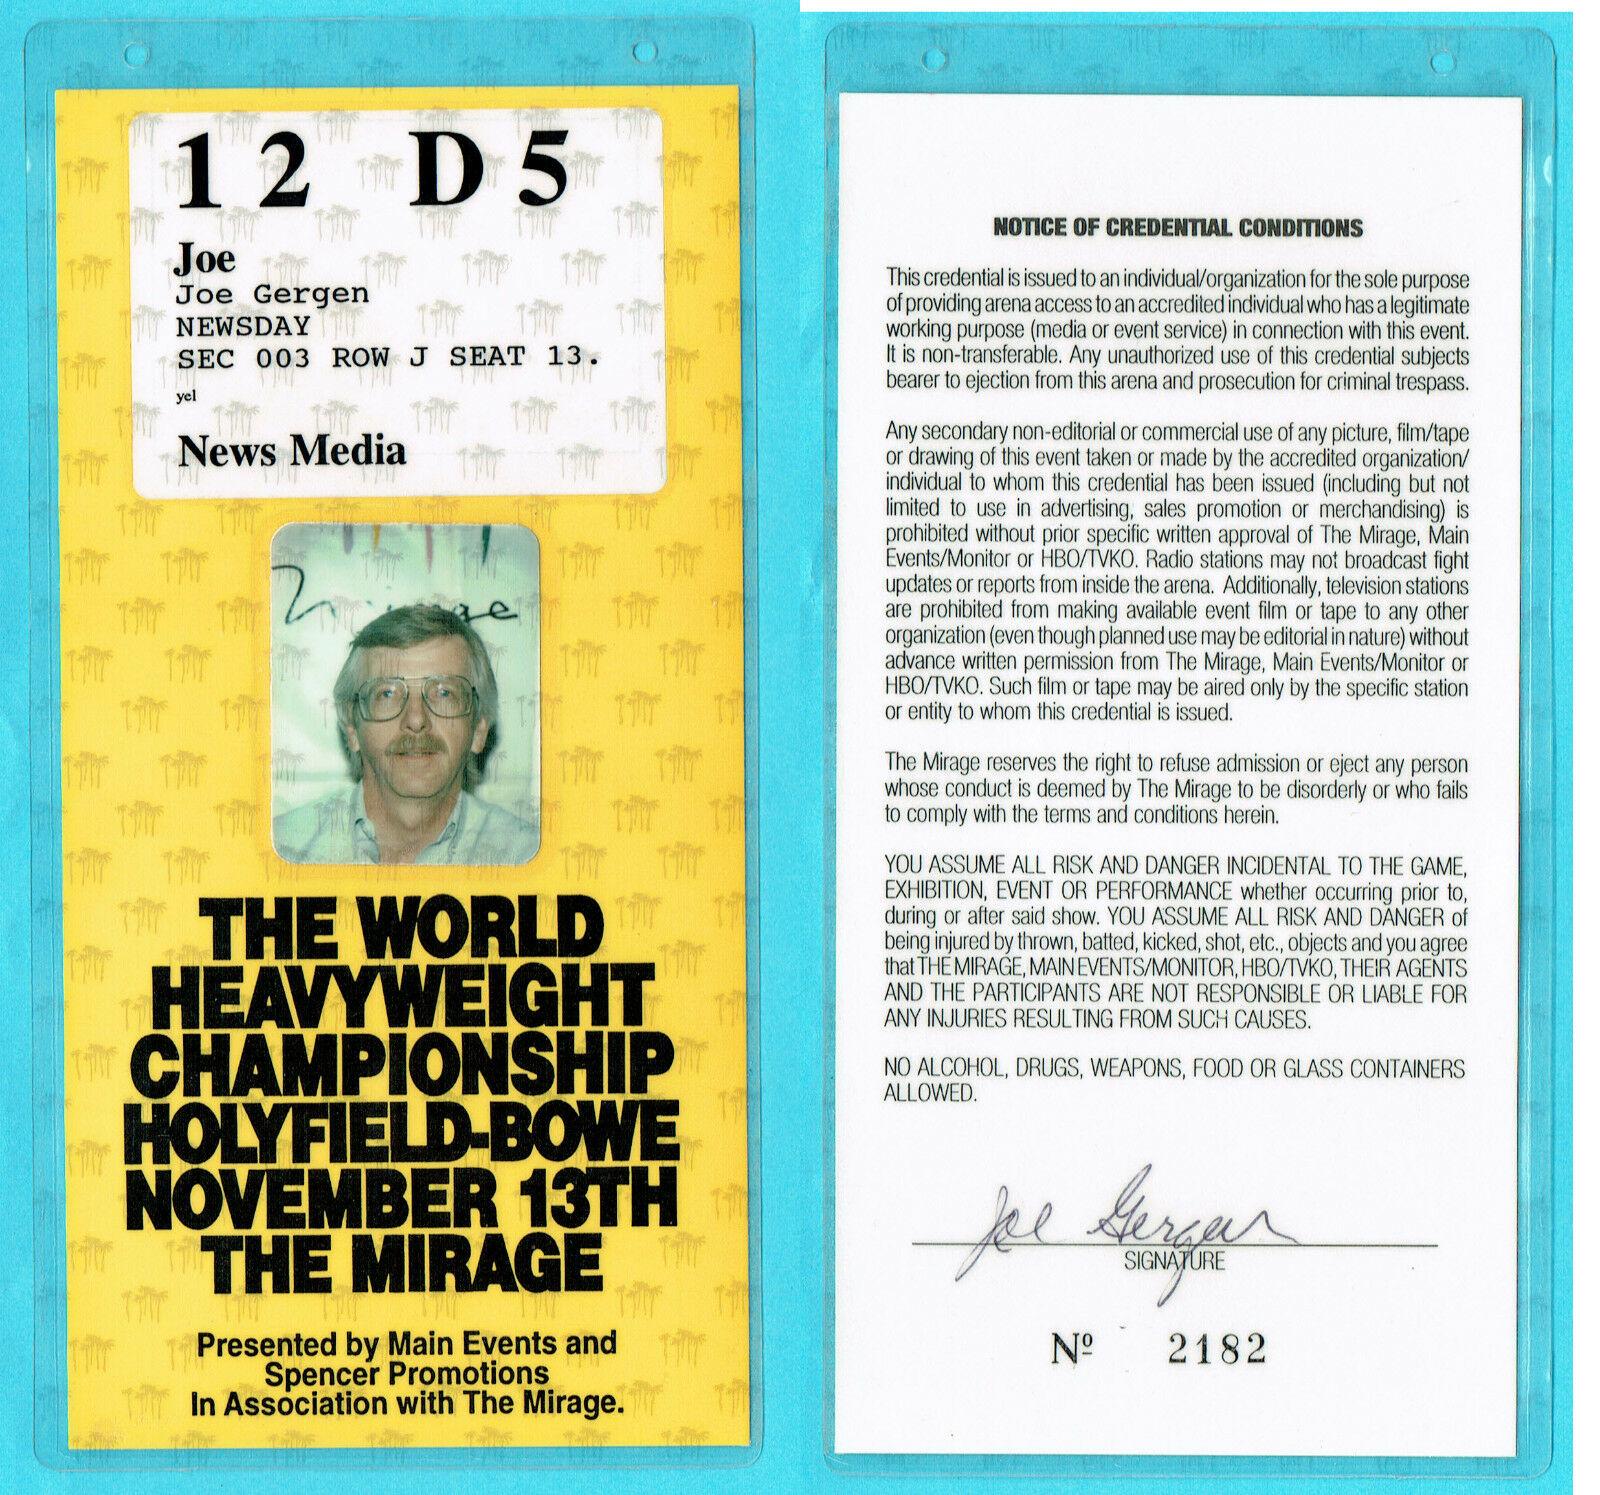 Heavyweight Championship Evander Holyfield / Bowe Media Press Pass ticket mint